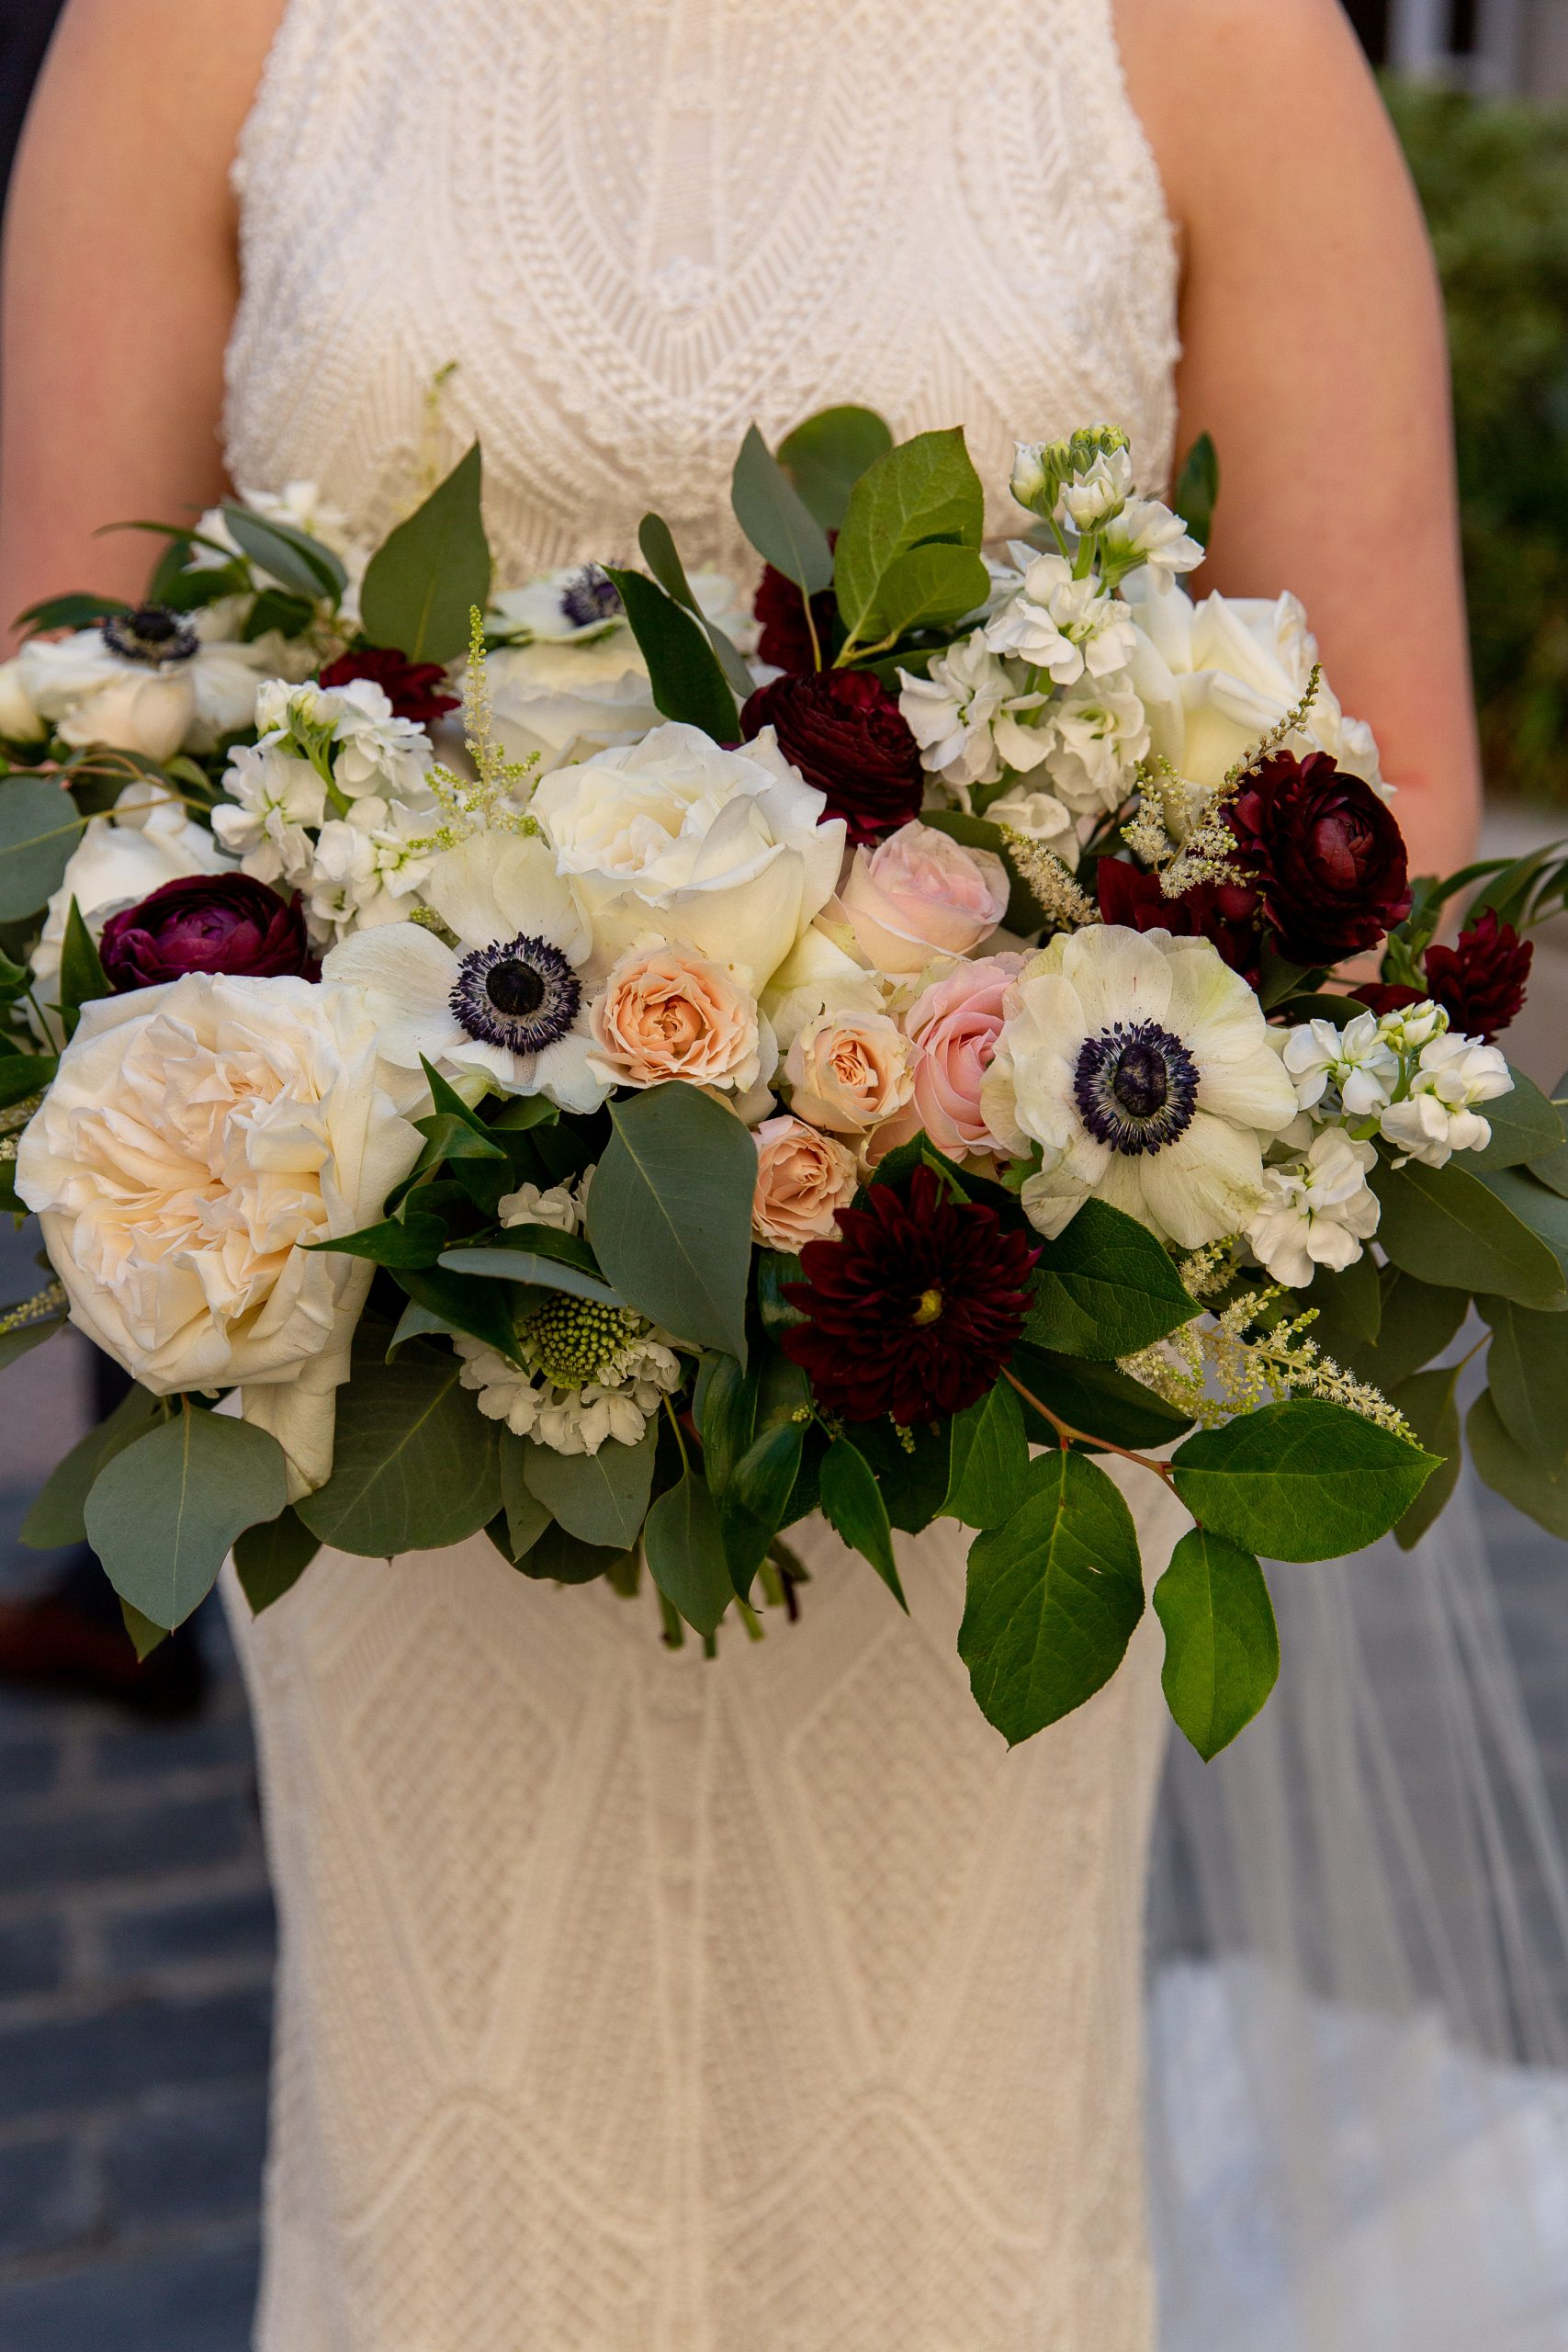 Kiley Wedding - DCM Photo - Bouquet